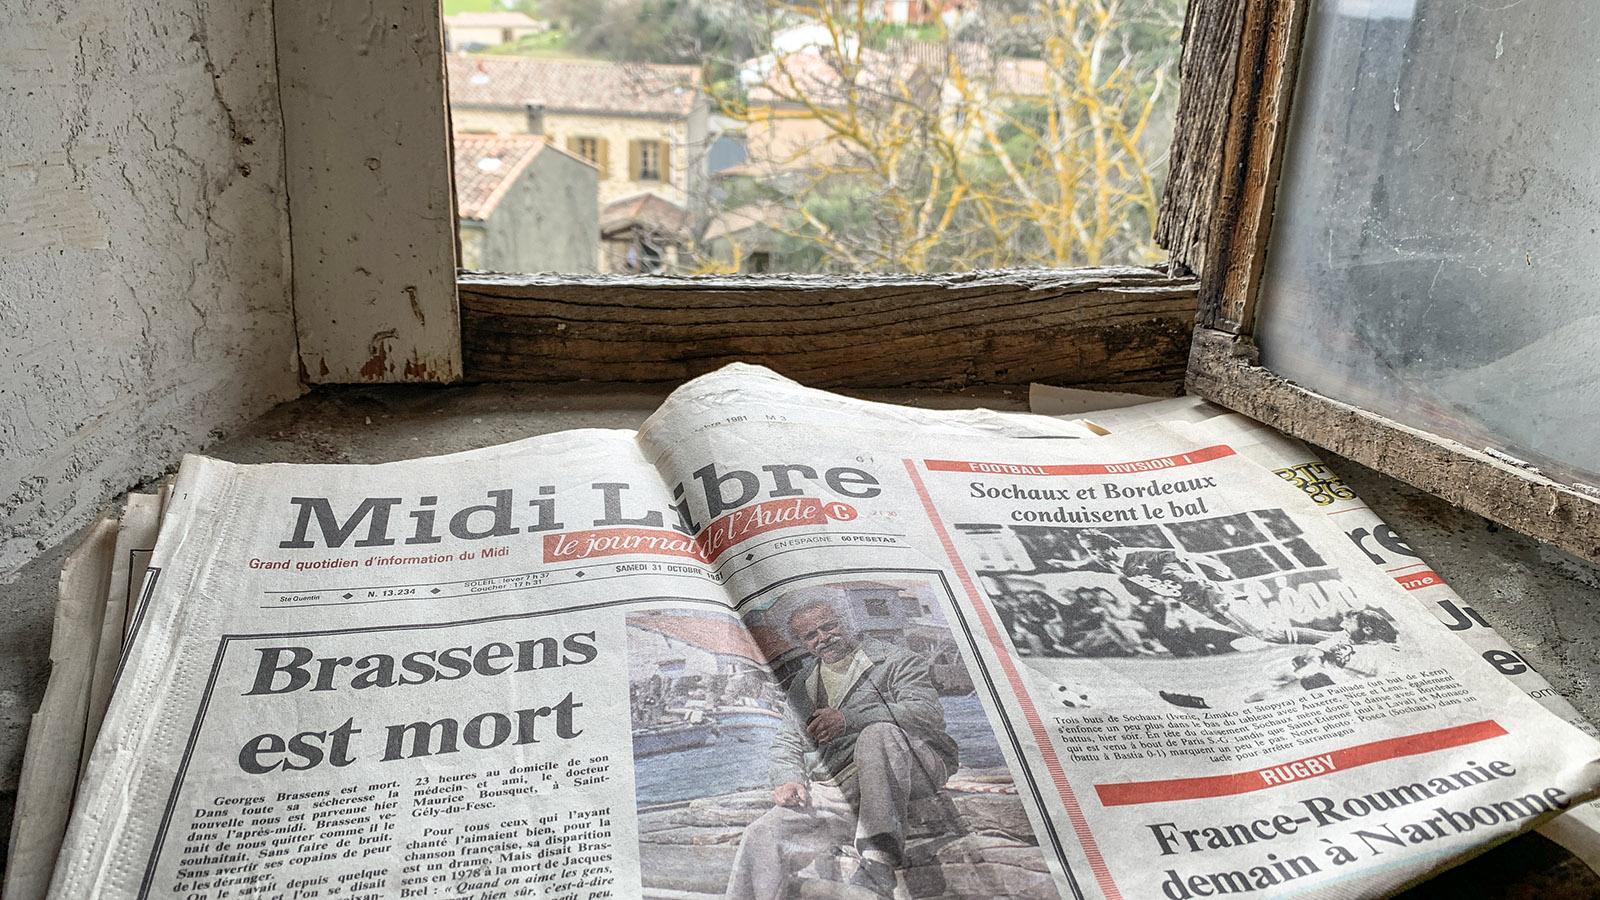 La Serpent: Midi Libre vom 31.10.1981. Foto: Hilke Maunder